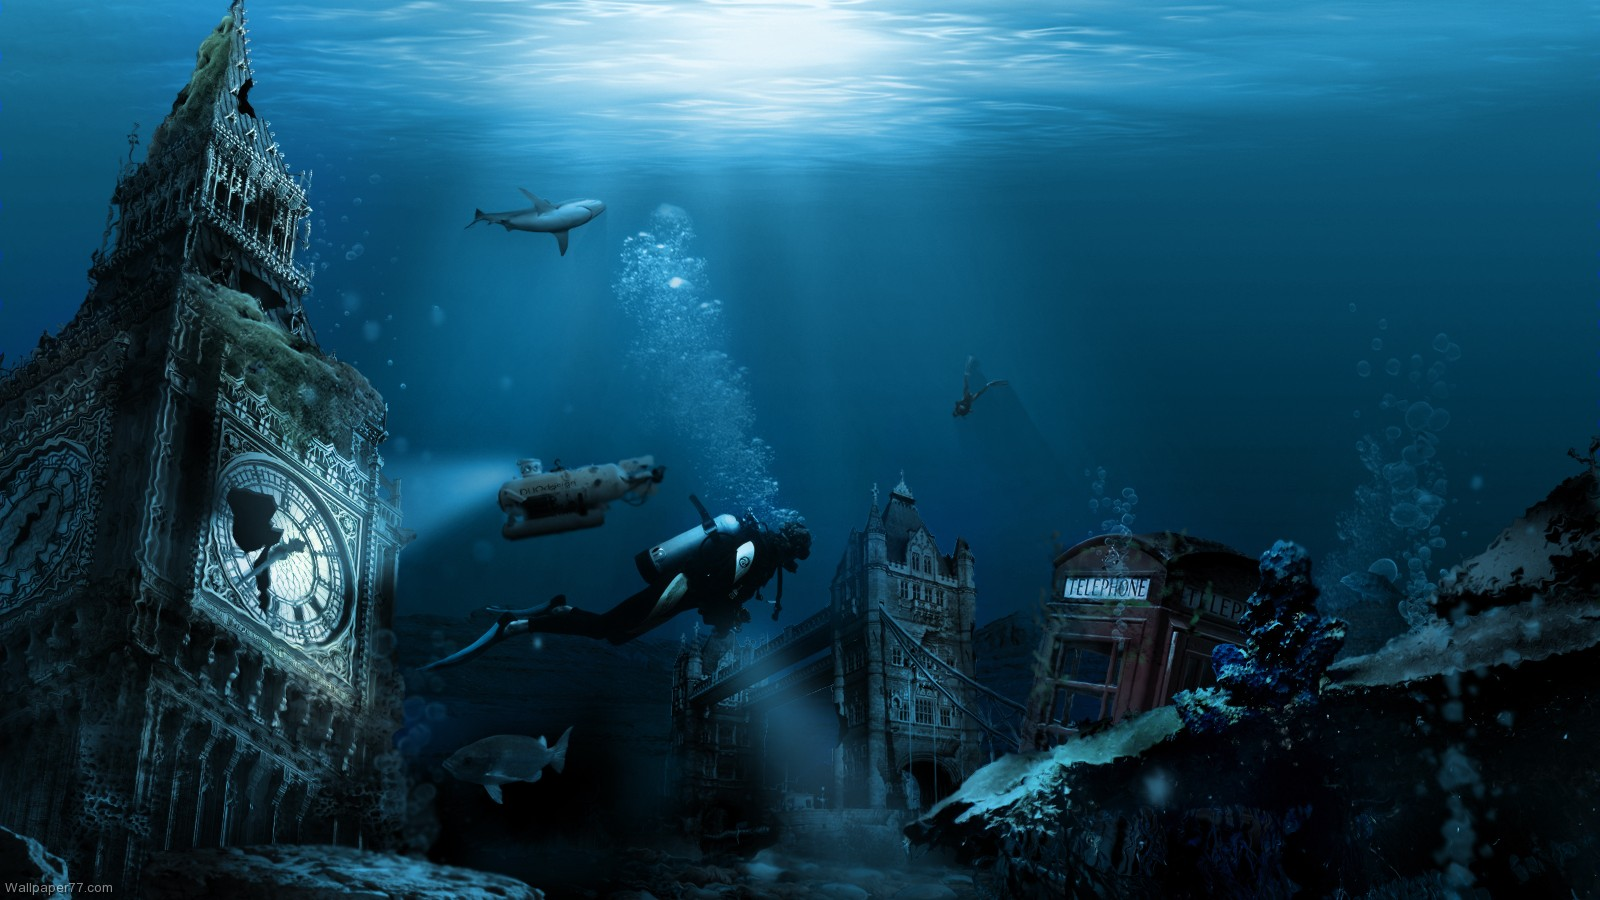 Undersea City 1600x900 pixels Wallpapers tagged Ocean sea 1600x900